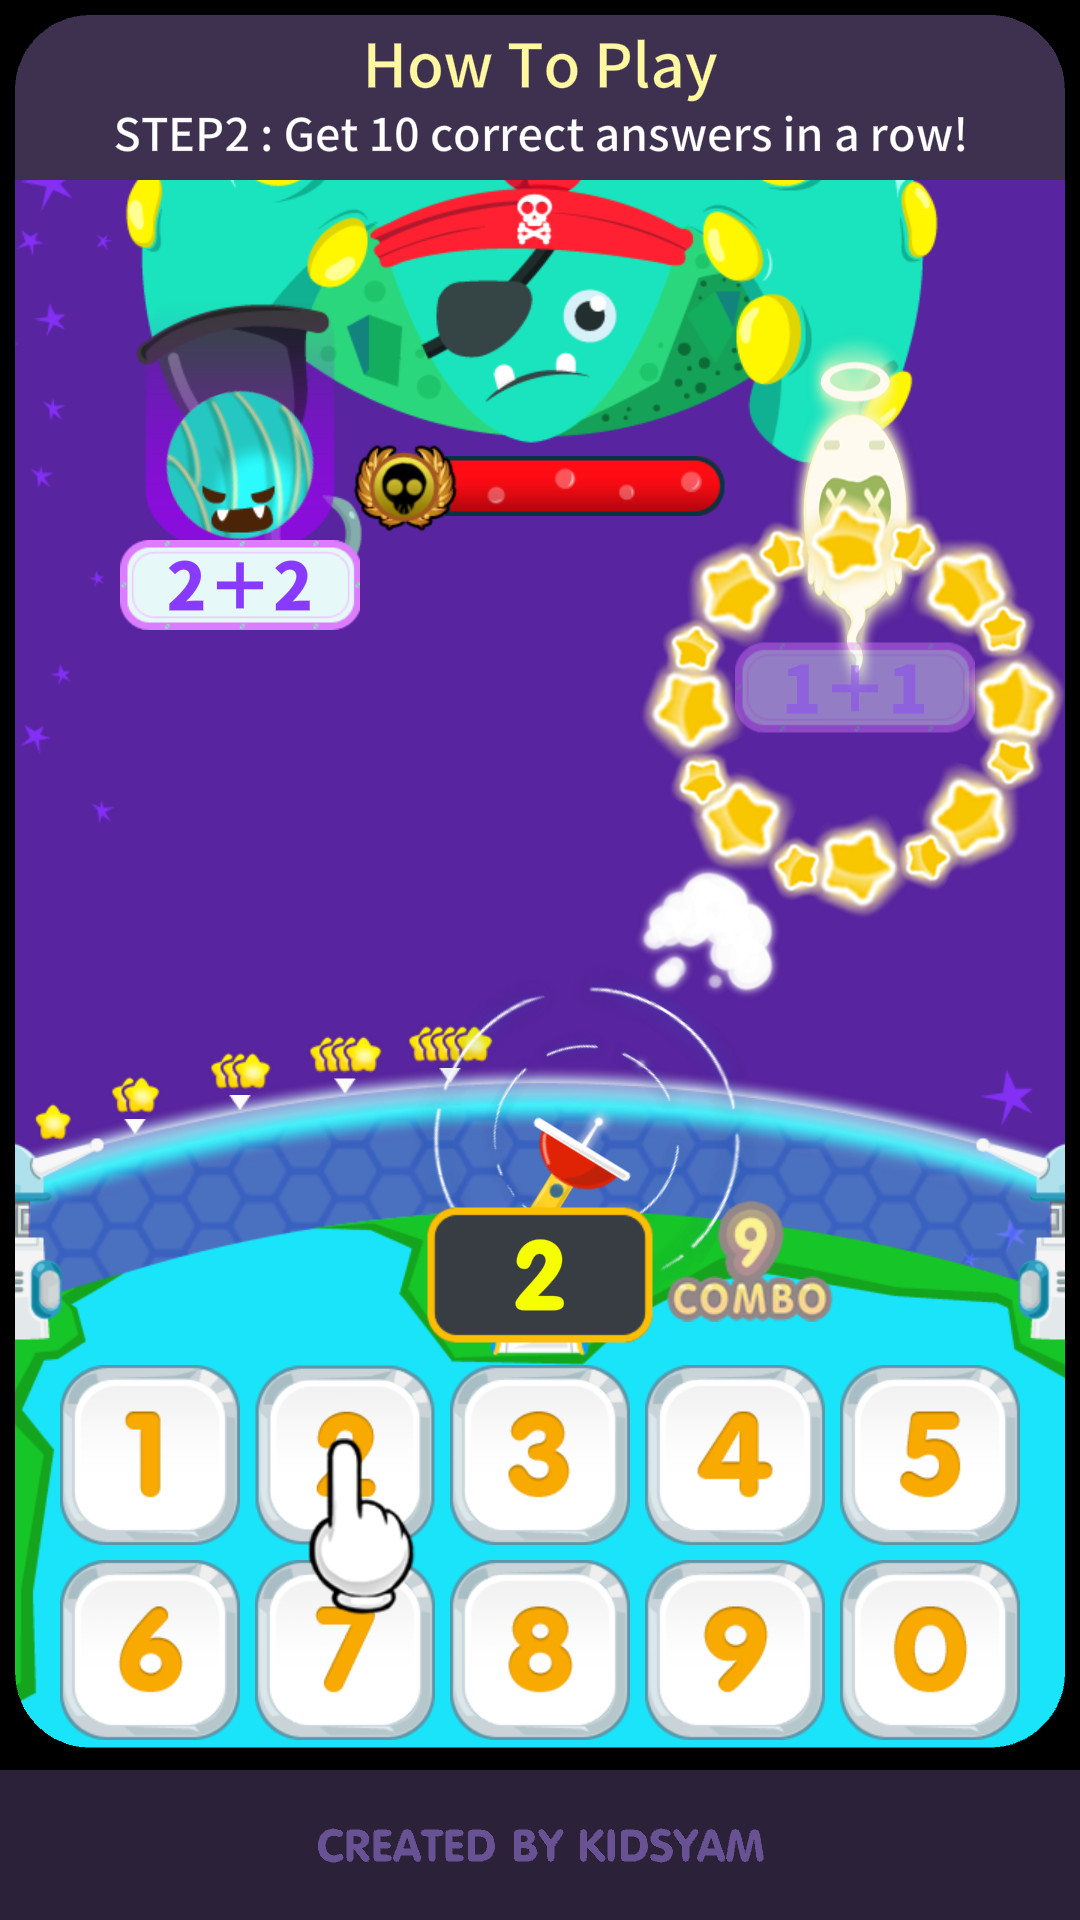 KidsYam's Math Rangers